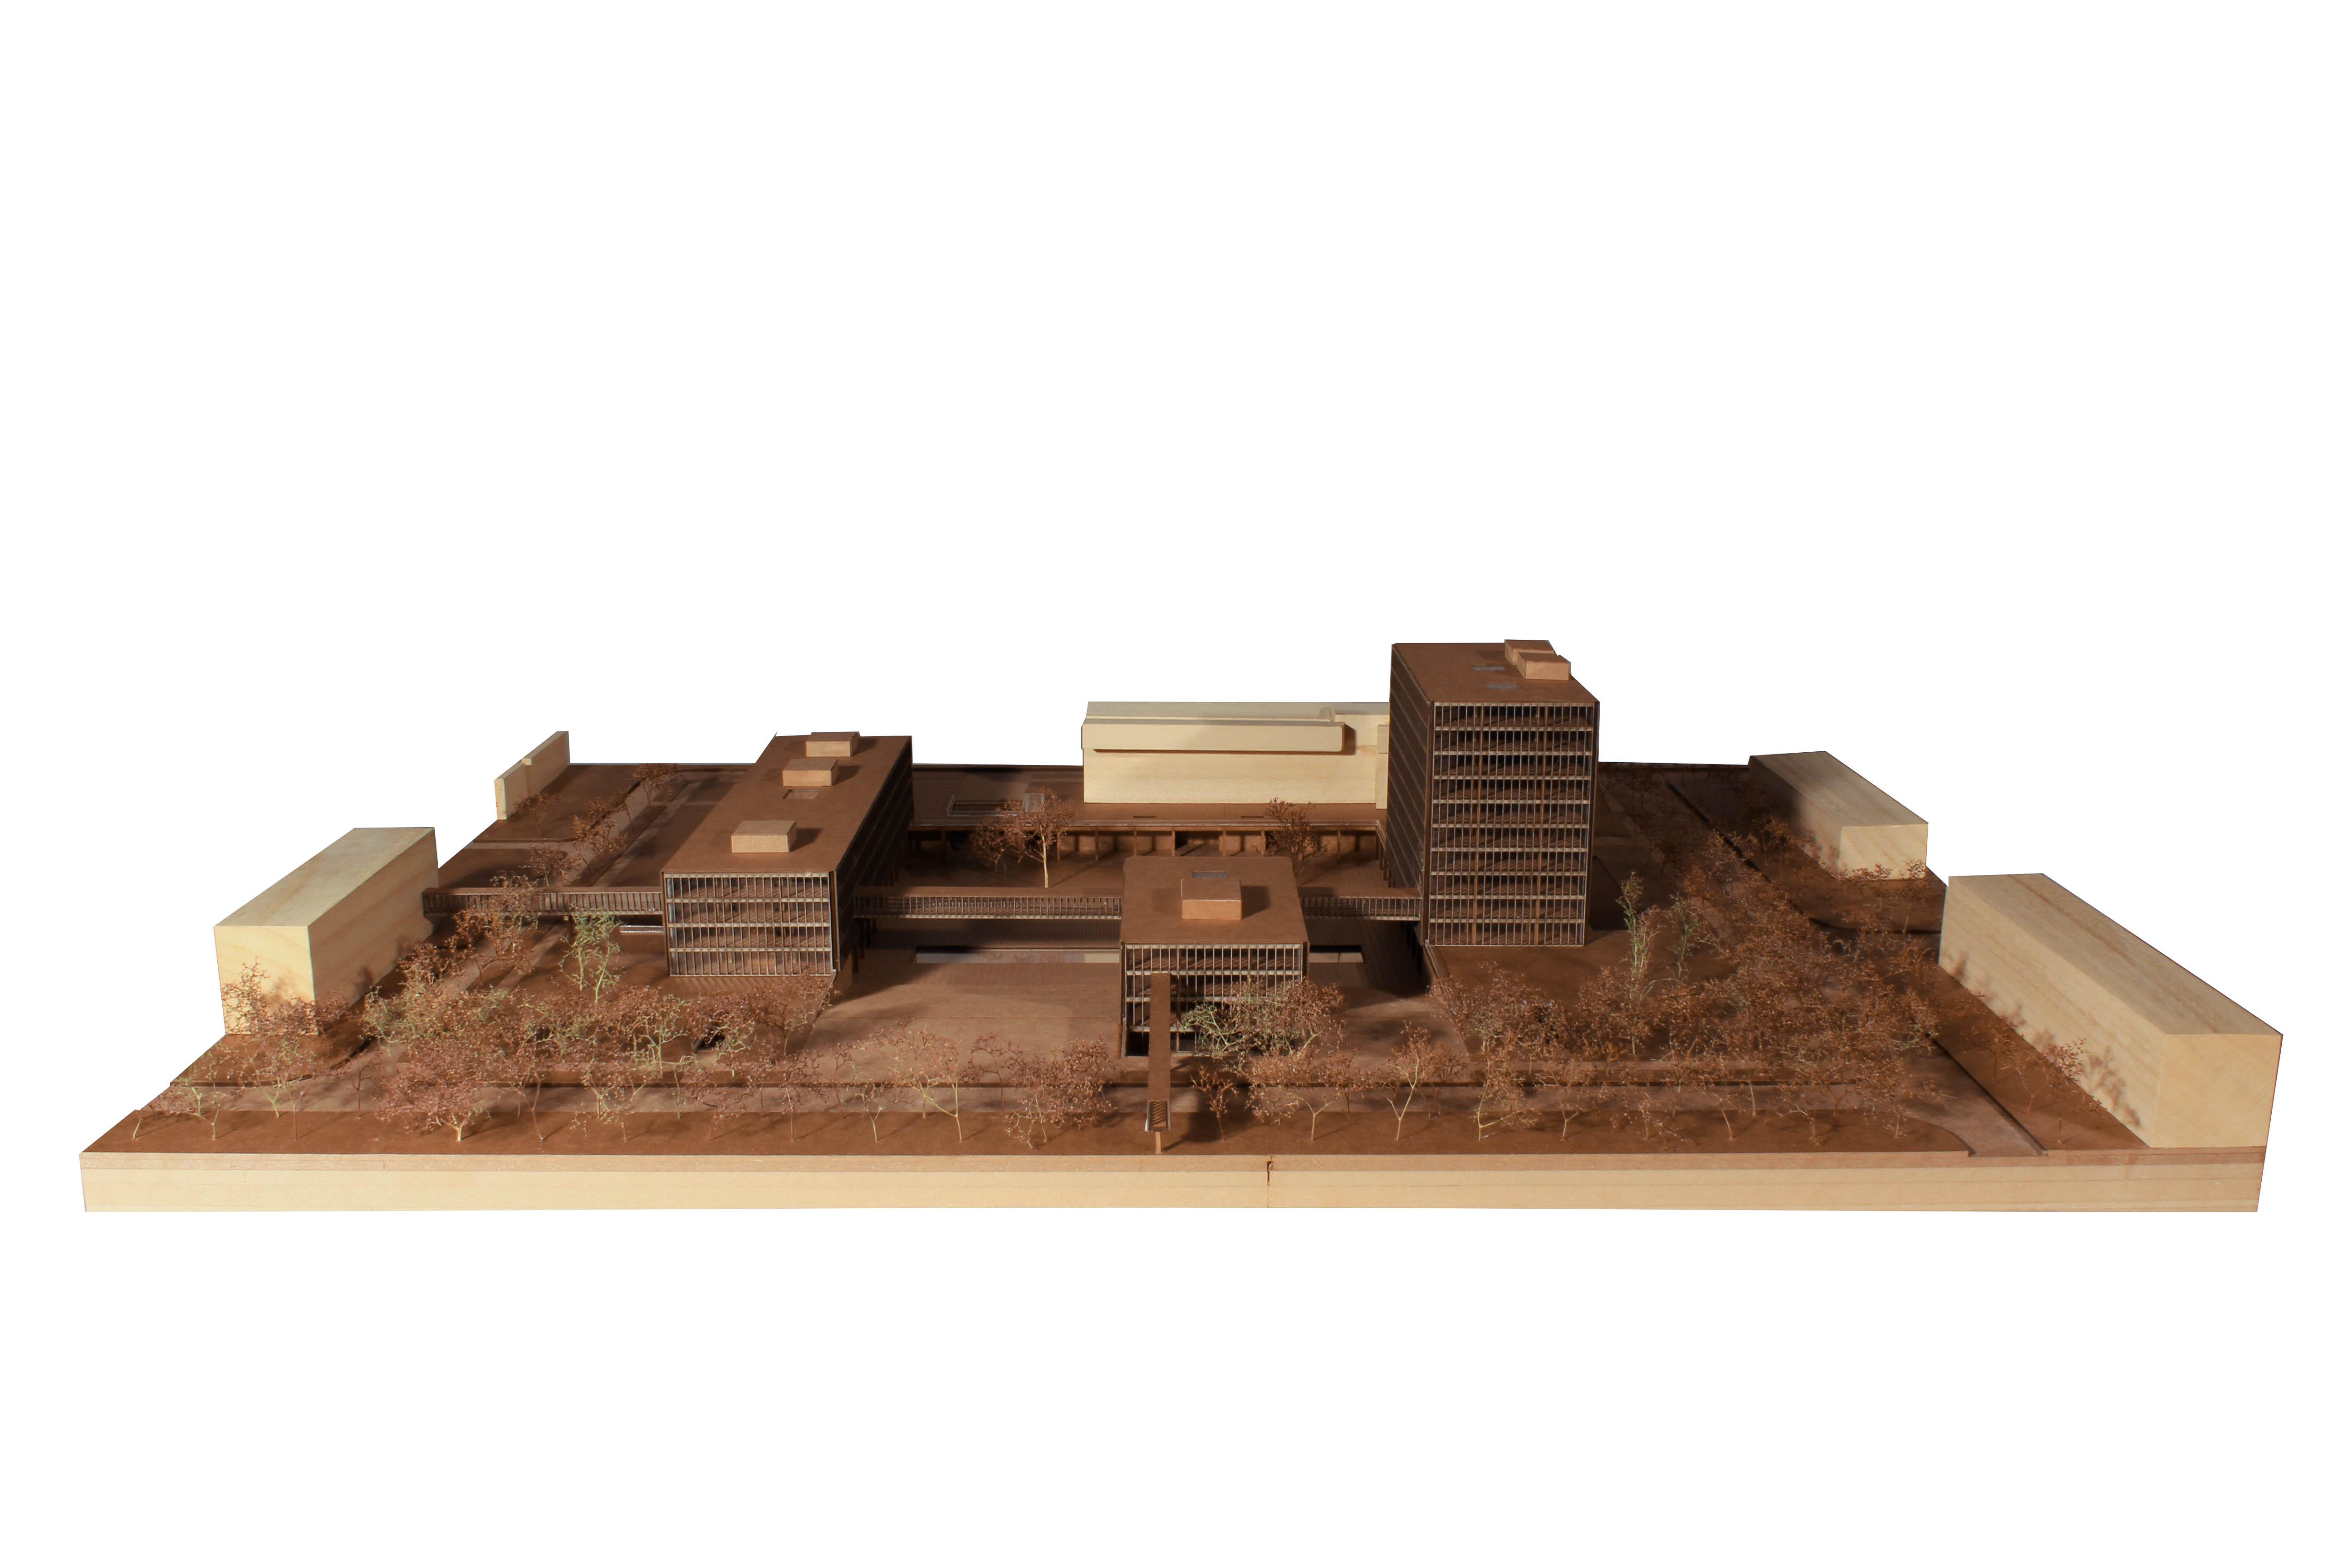 Maquette Architect Wijchen